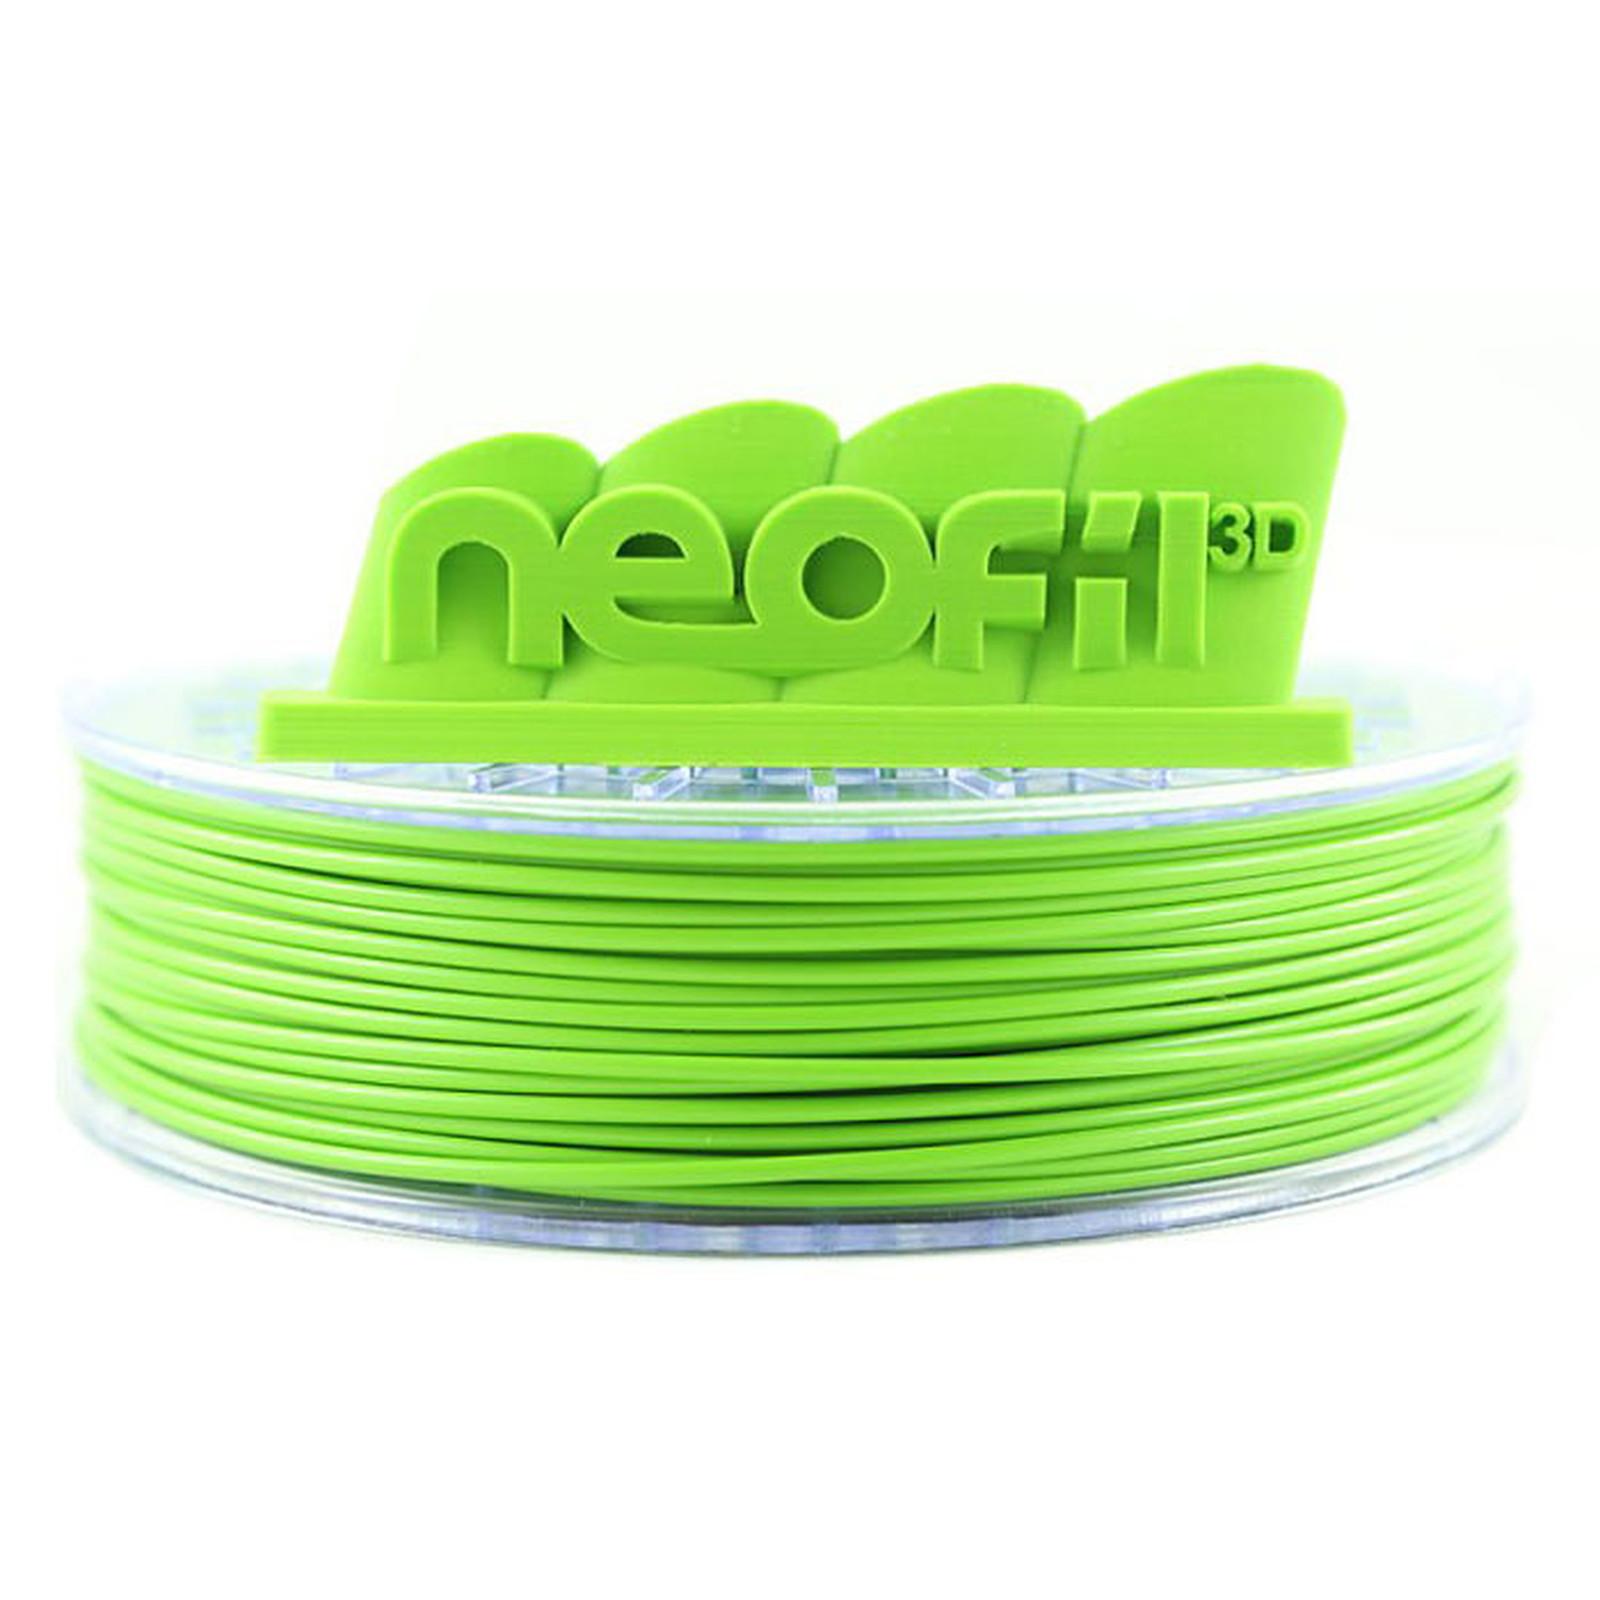 Neofil3D Bobine ABS 2.85mm 750g - Vert pomme